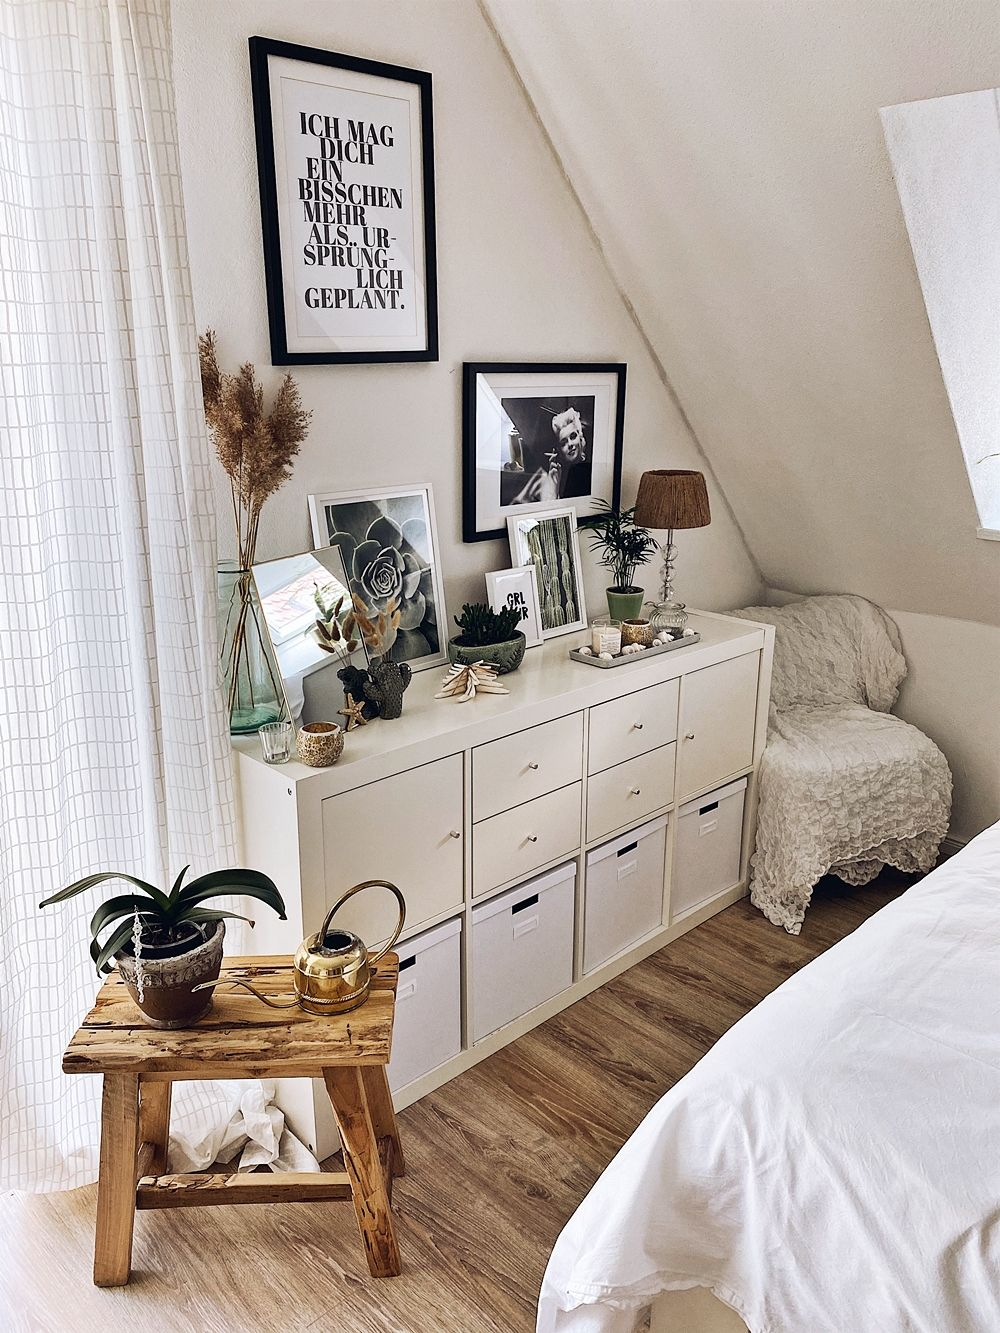 Photo of DIY – Zimmer umgestalten + Lampenschirm aus Juteseil – Fashi…